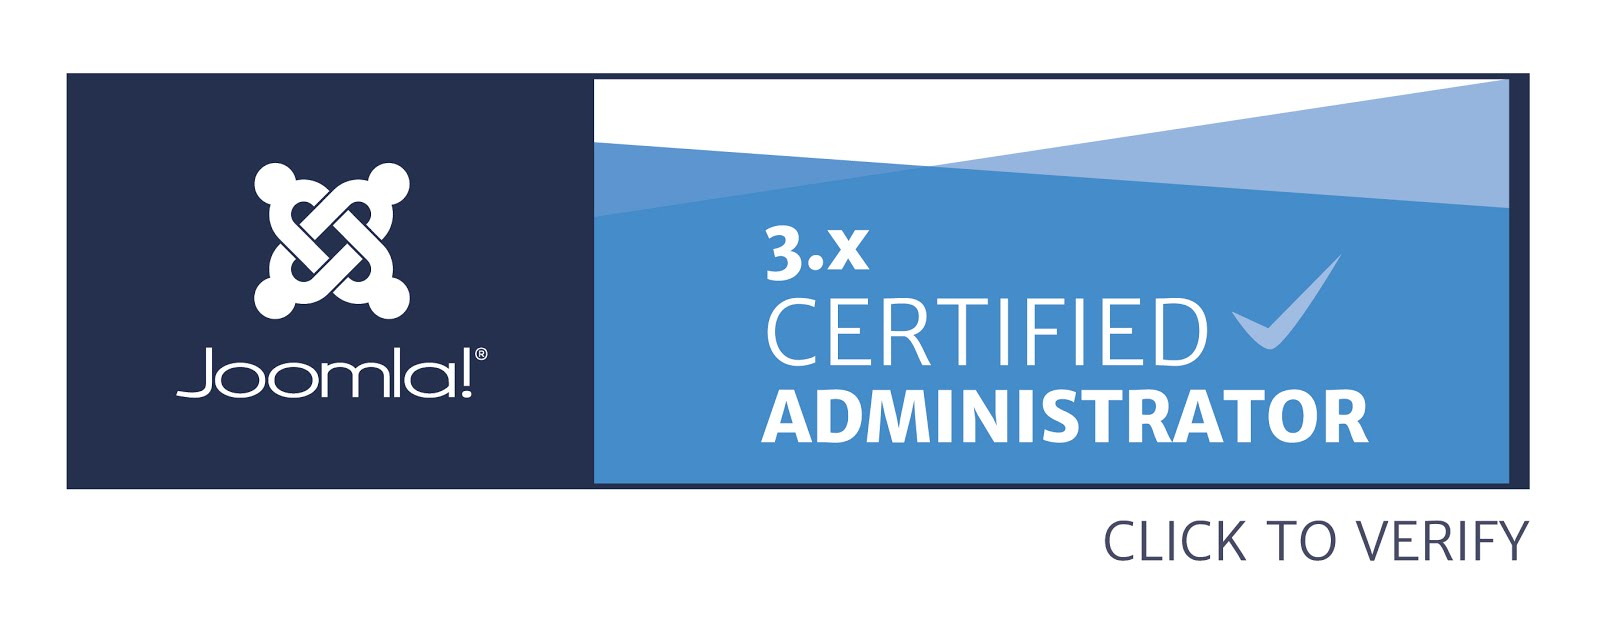 Joomla! 3.x Certified Administrator